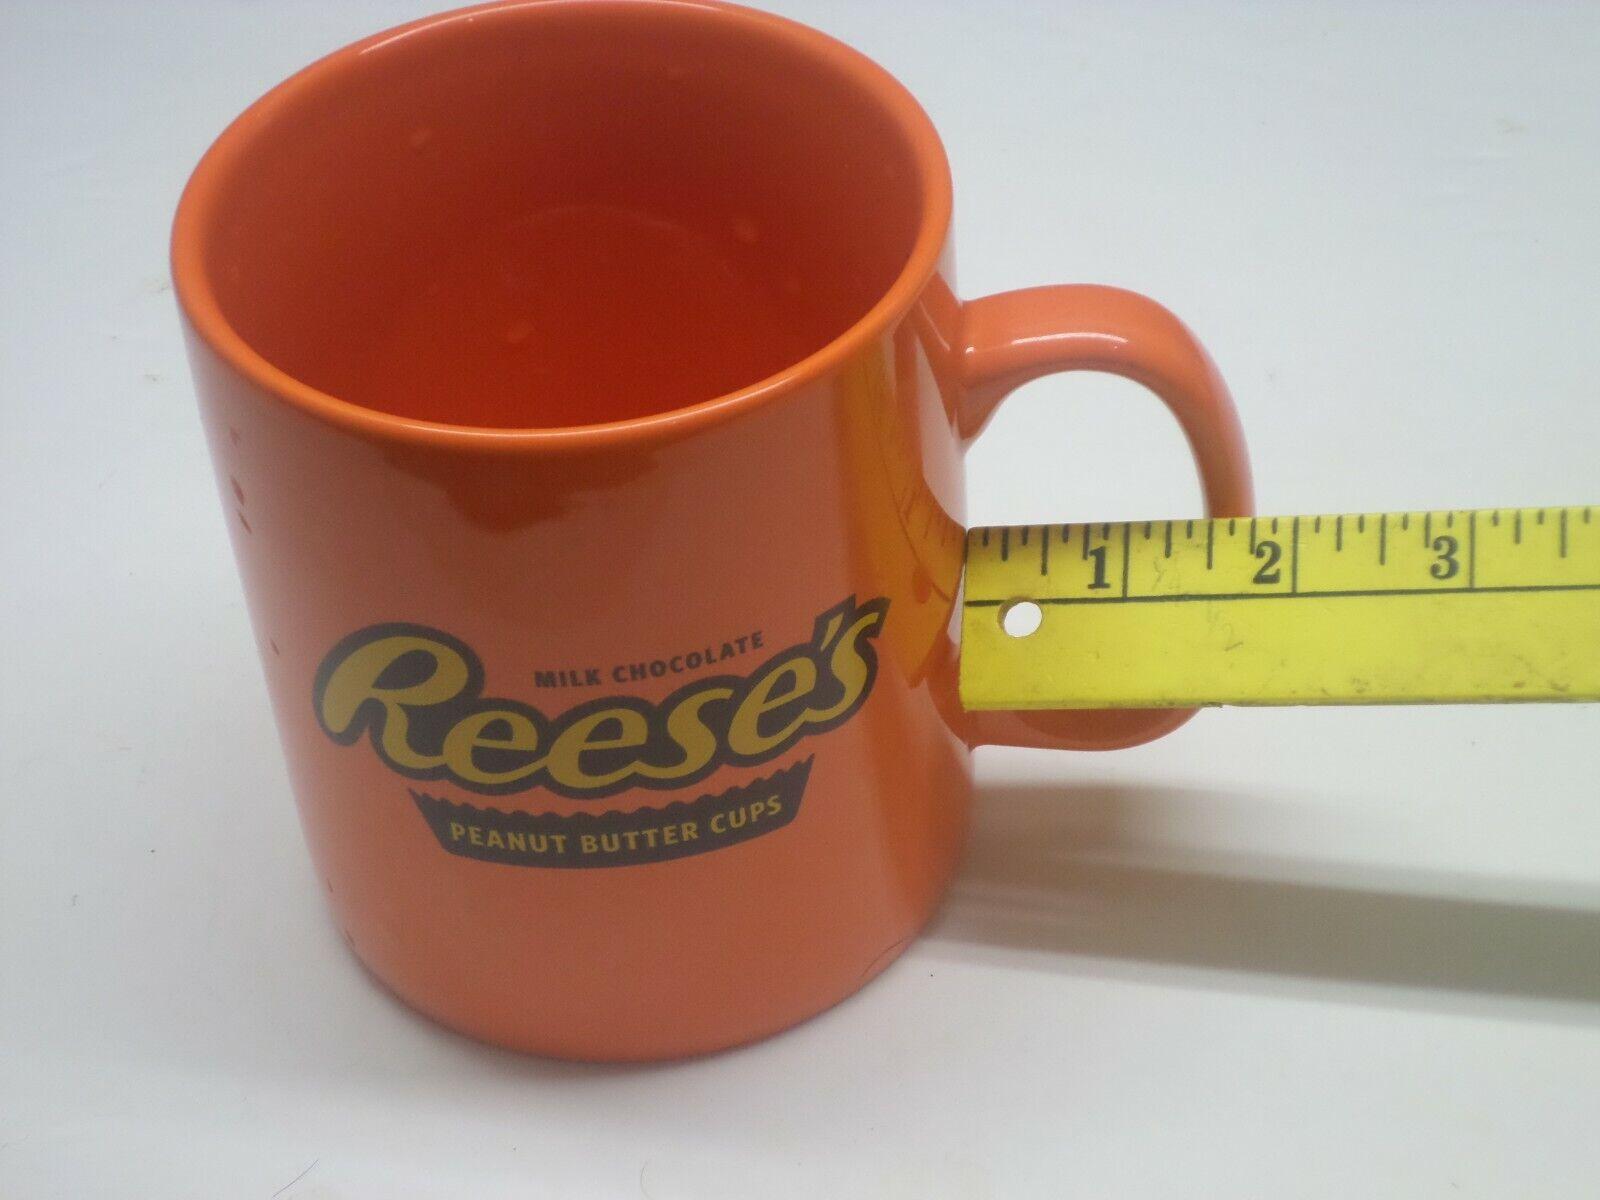 Купить Reese's Peanut Butter Cup -  Huge Reese's Peanut Butter Cup GalerIe Ceramic COFFEE TEA MUG Giant Soup Bowl